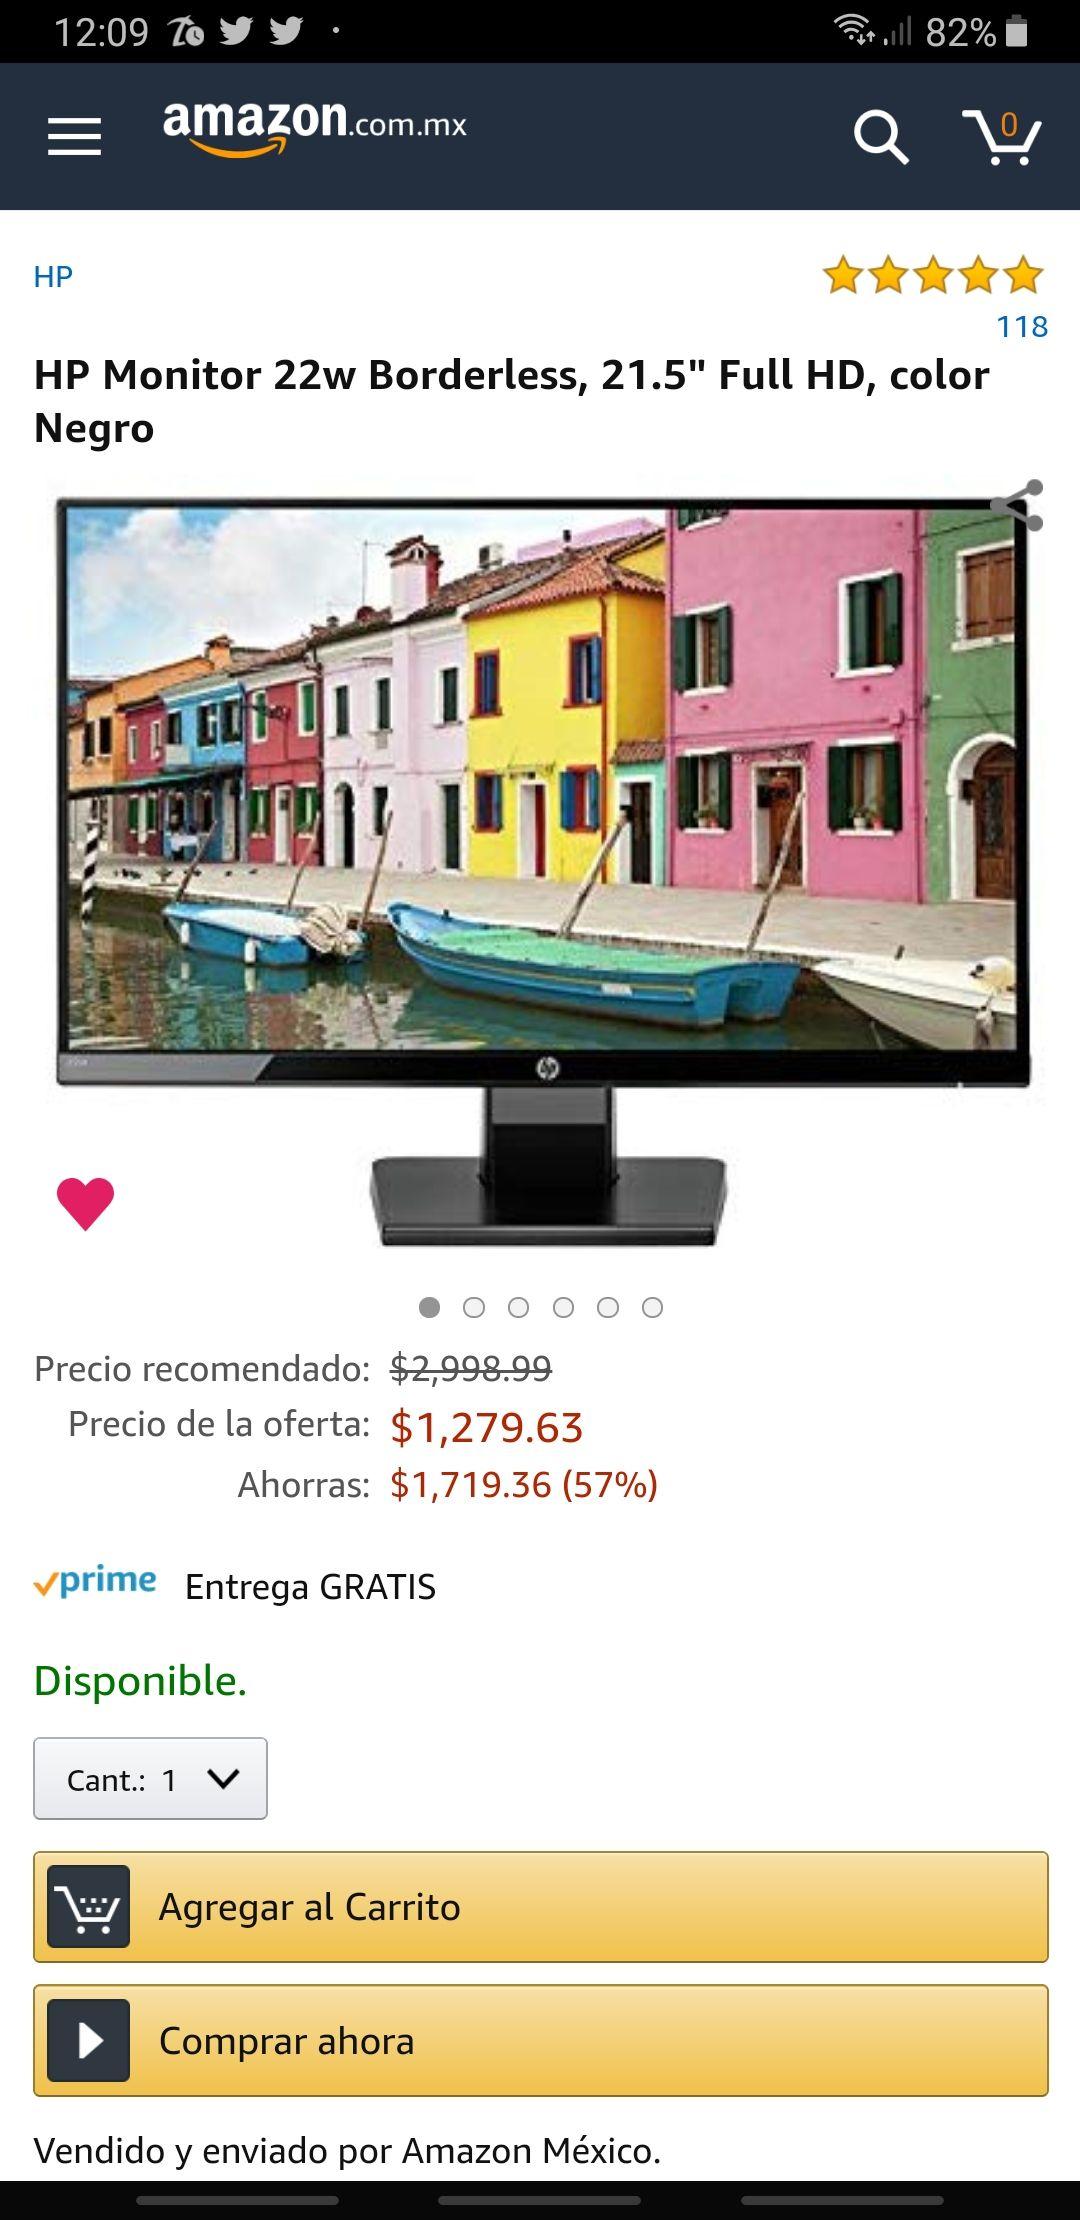 Amazon: Monitor HP 20W borderless de nuevo en oferta.